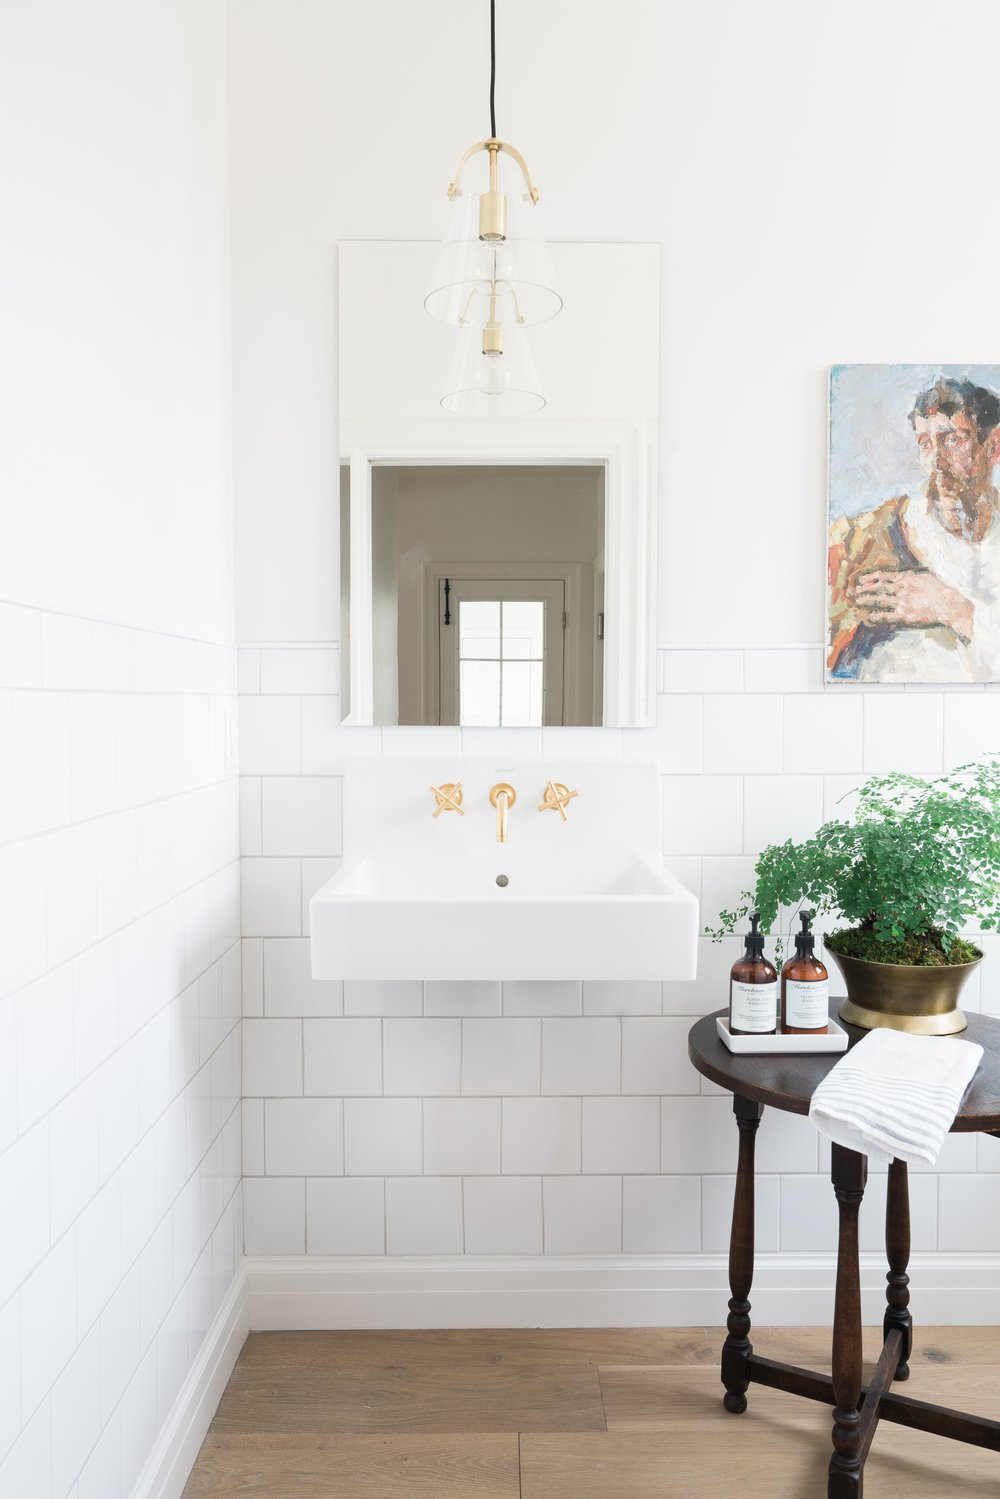 House of Jade Interiors | Travis J Photography | Karin Pendant by Mitzi